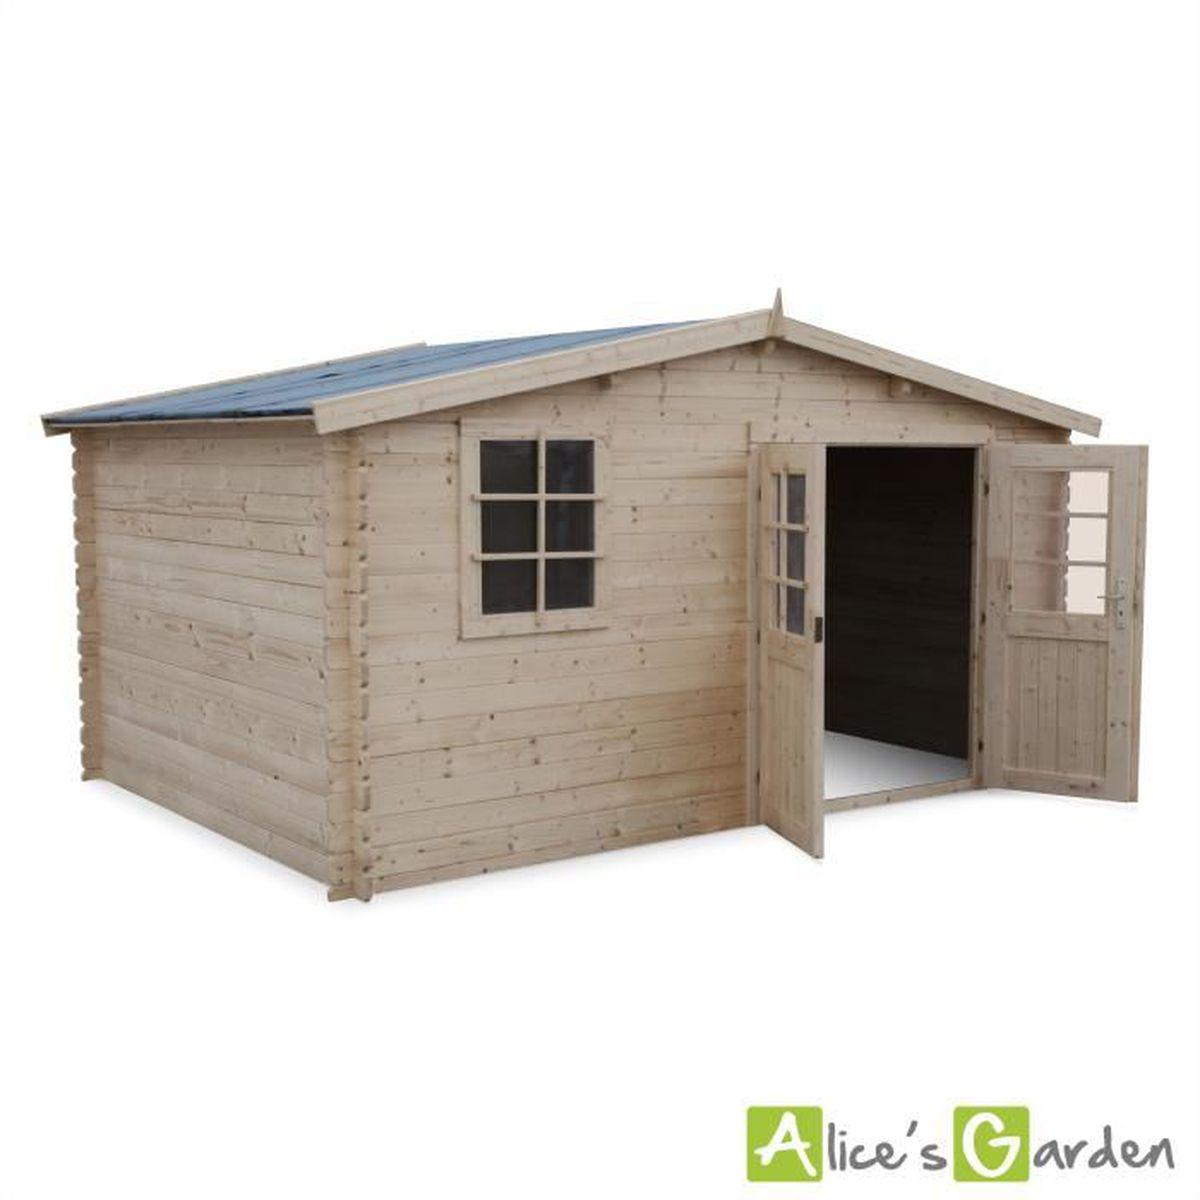 Plan Abri De Jardin En Bois abri de jardin iraty en bois fsc de 12,28m² + plancher